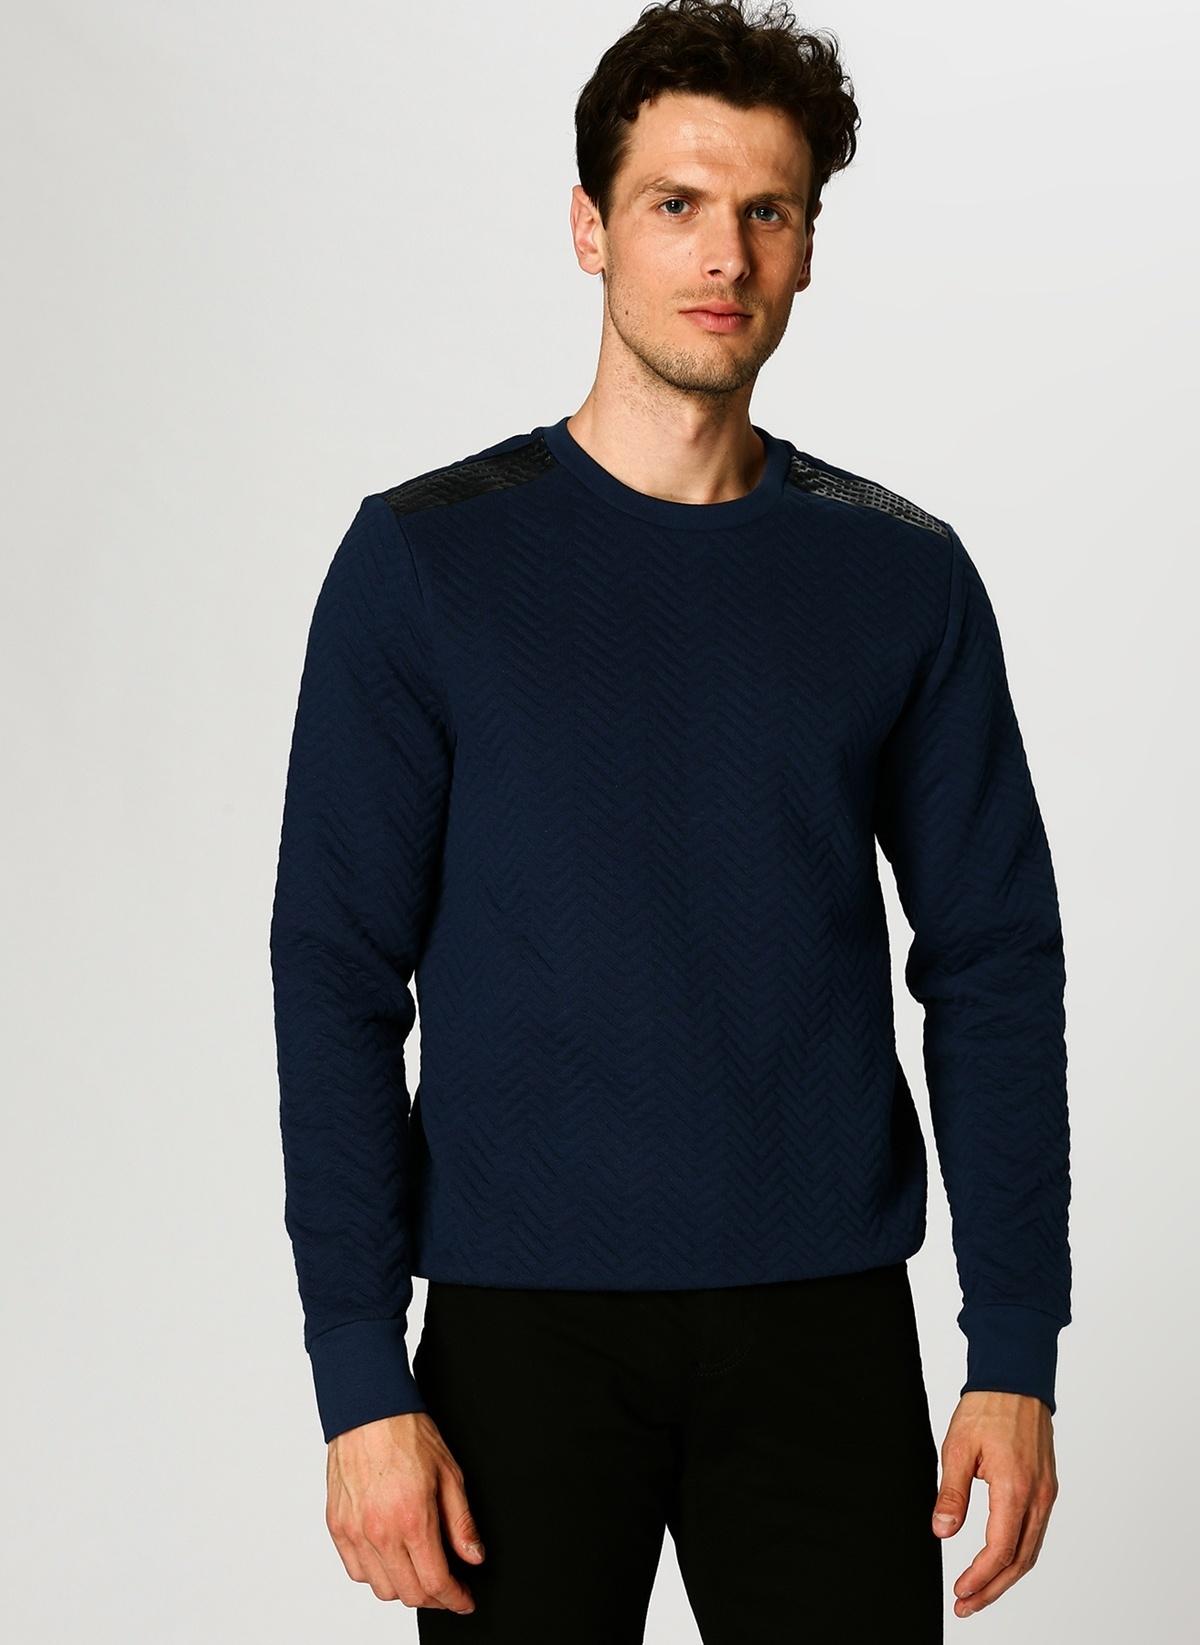 Fabrika Sweatshirt 28-ad14-a7-r2-2 Fabrika Sweatshırt – 79.99 TL